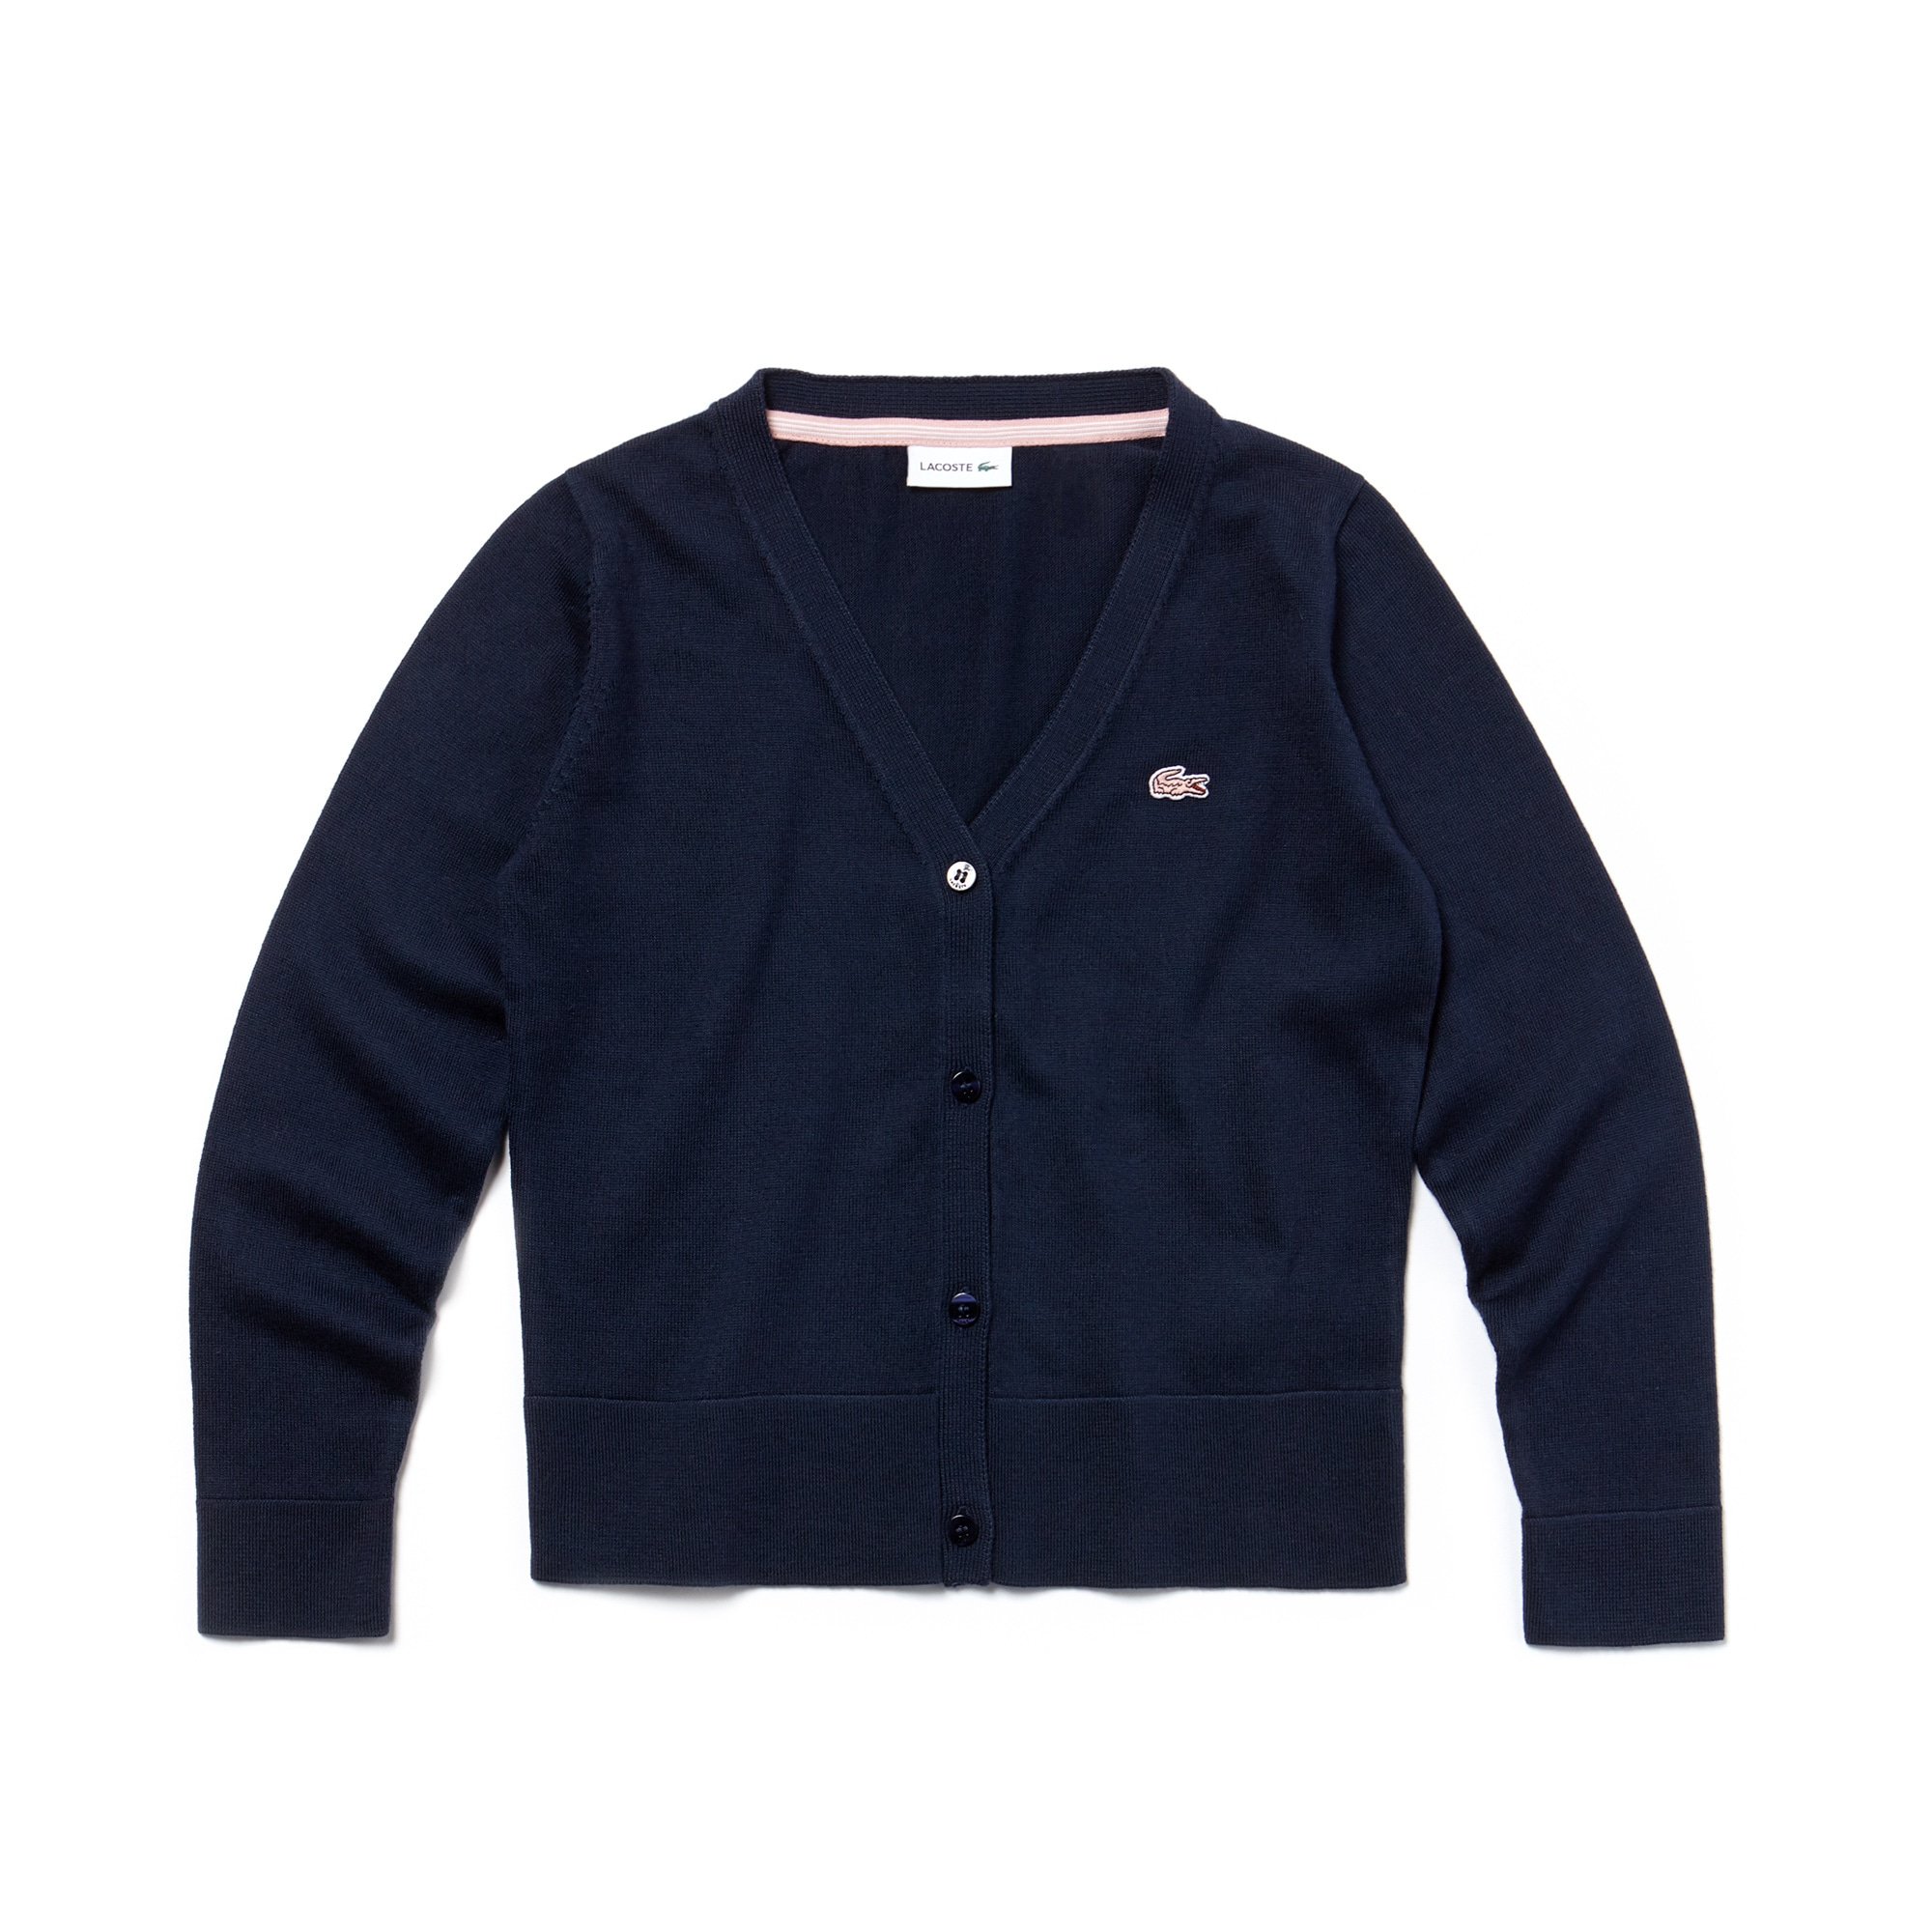 Cardigan Bambina in jersey di cotone tinta unita